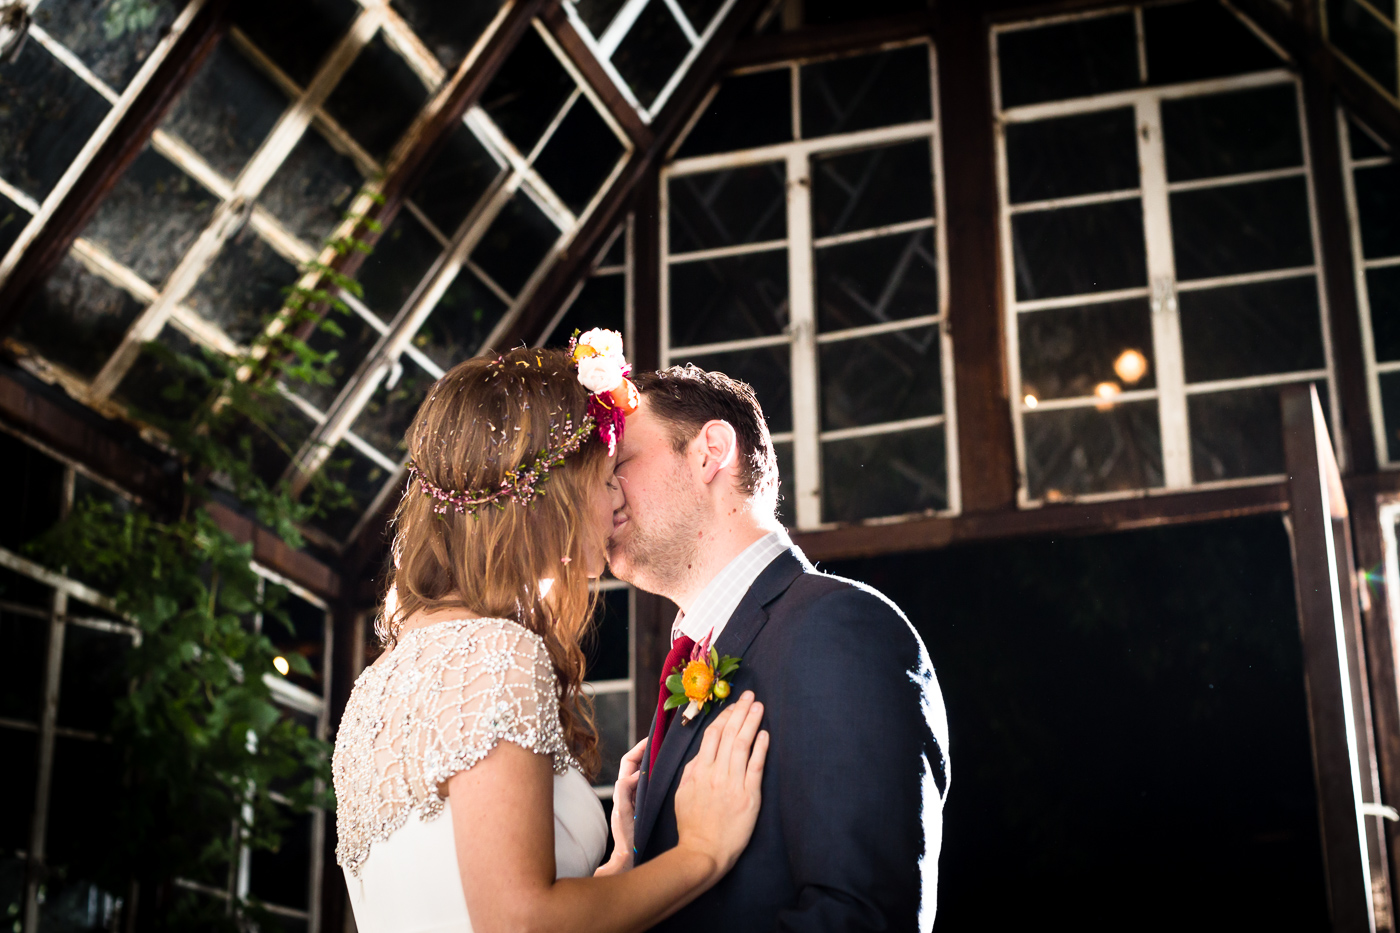 austin-wedding-photographer-videographer-007.jpg